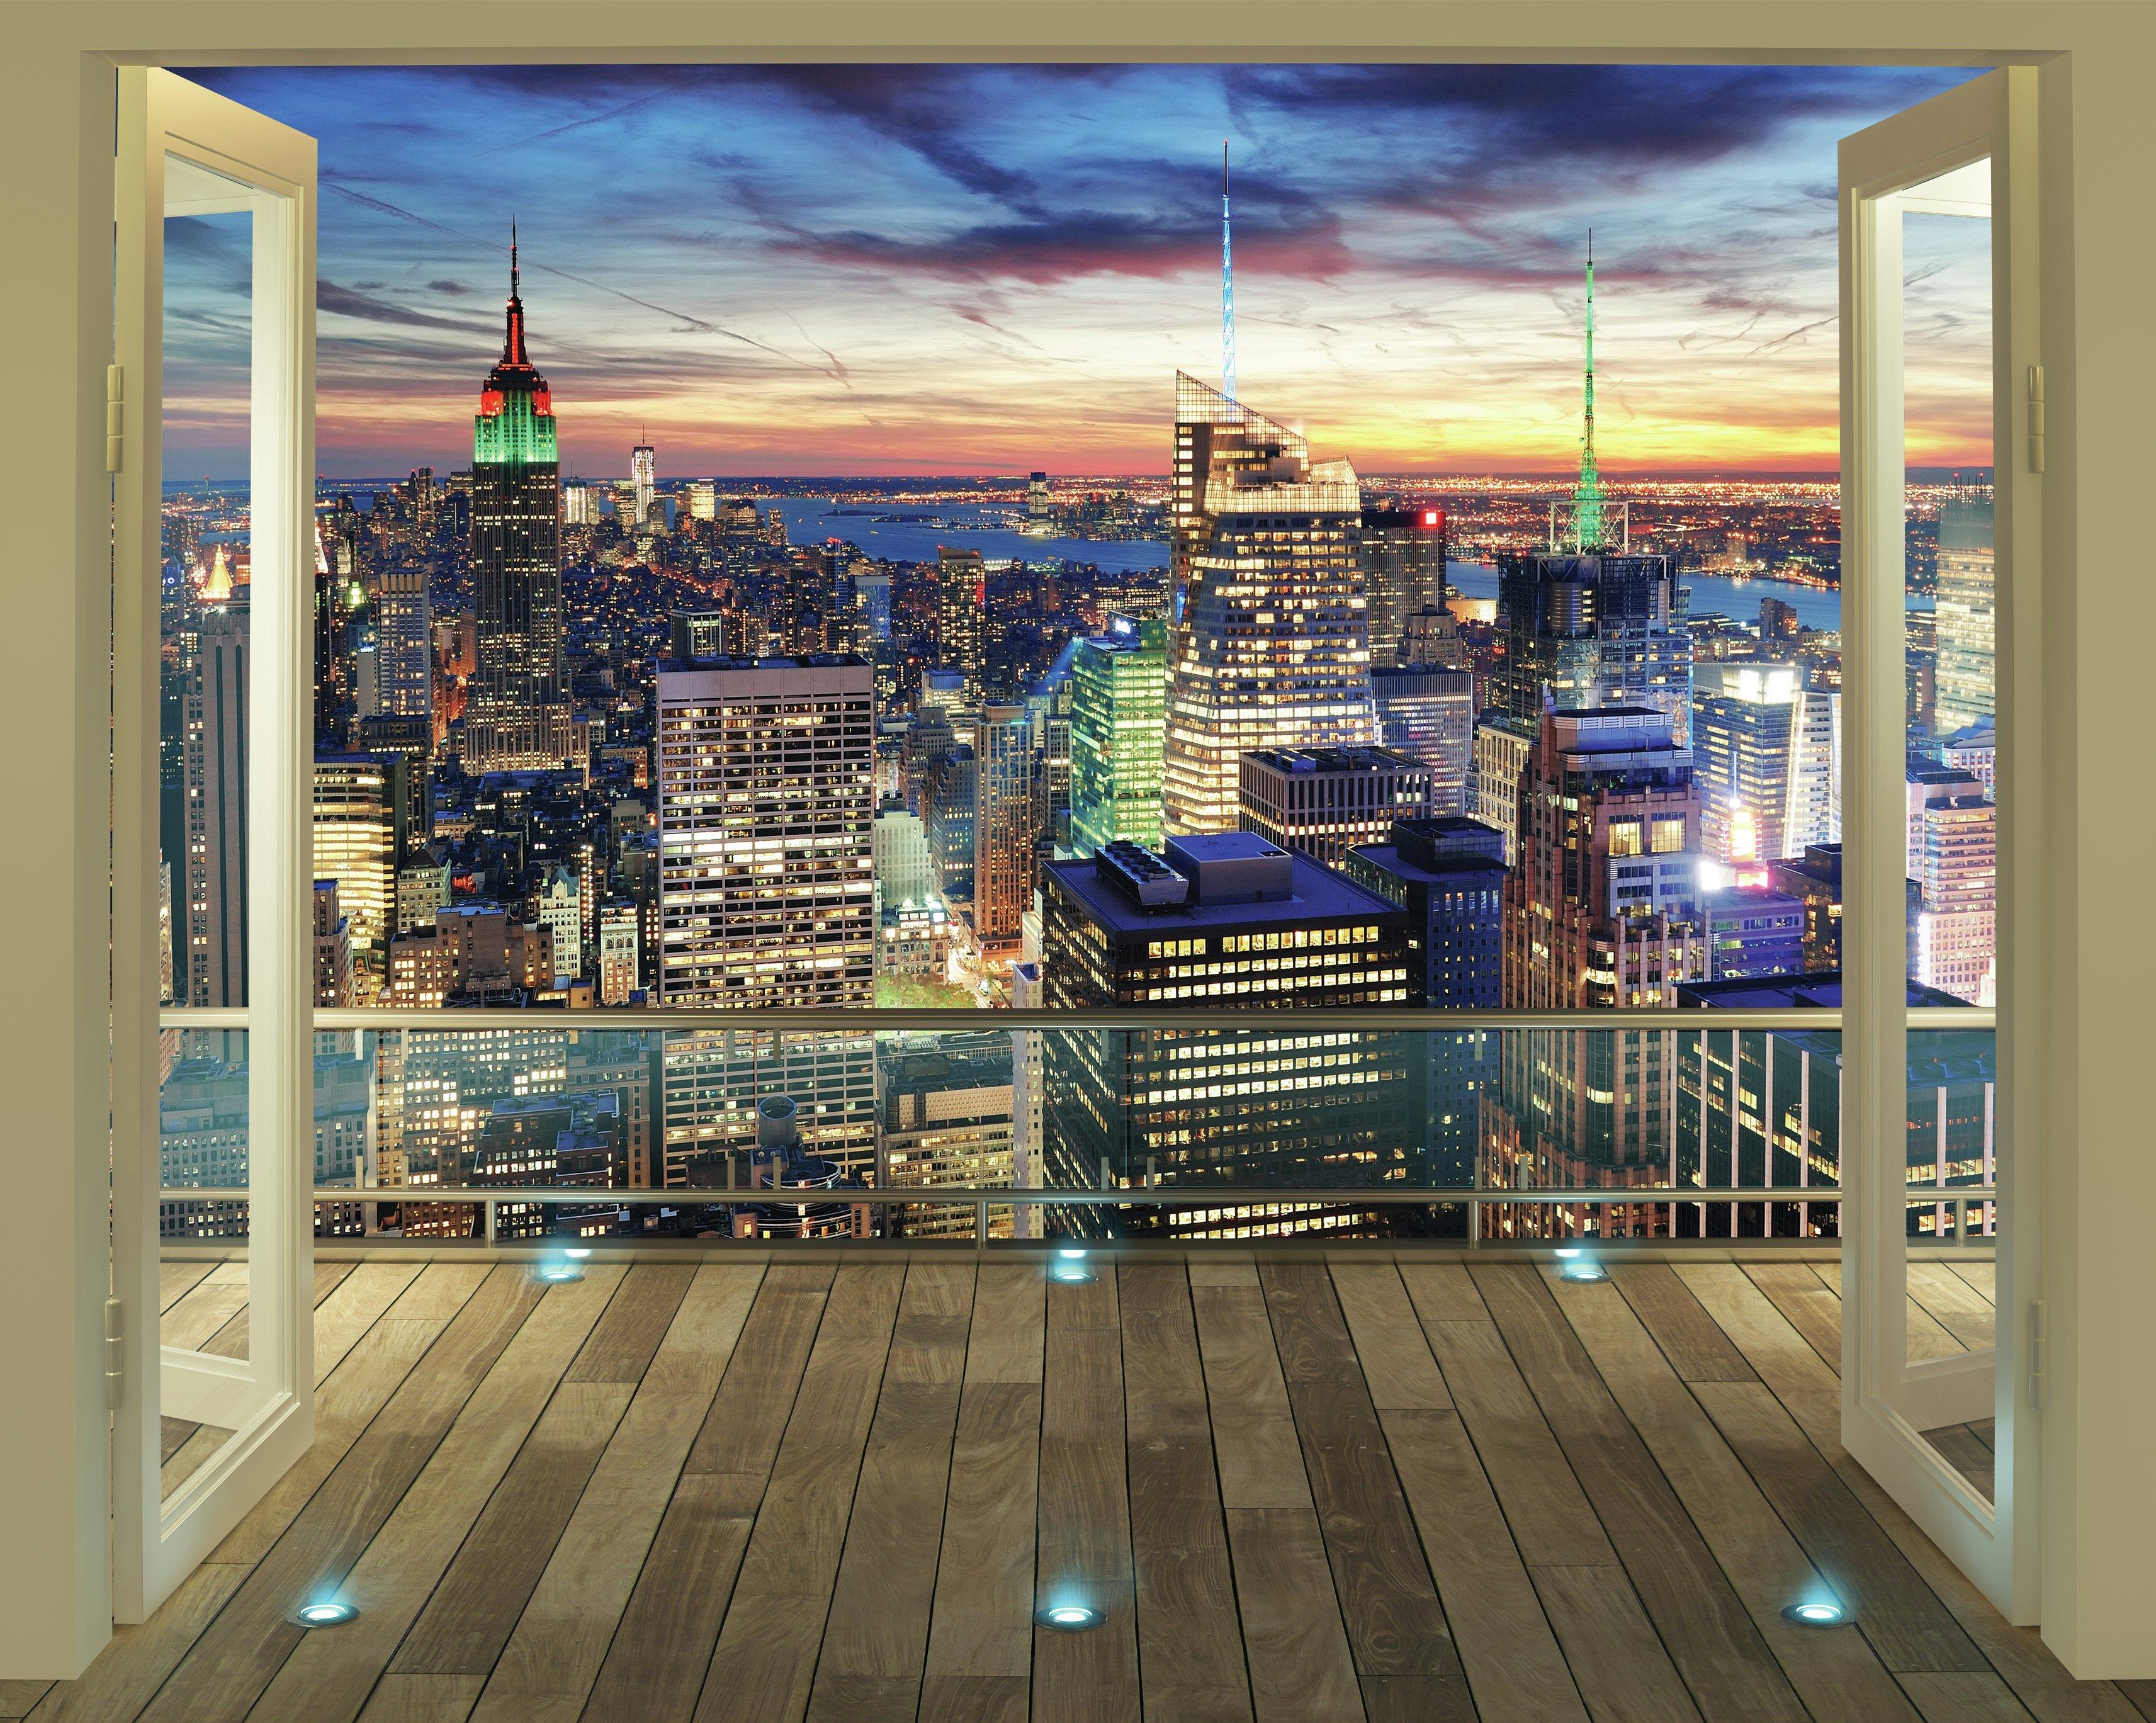 Buy Walltastic New York City Skyline Wallpaper Mural at Argosco